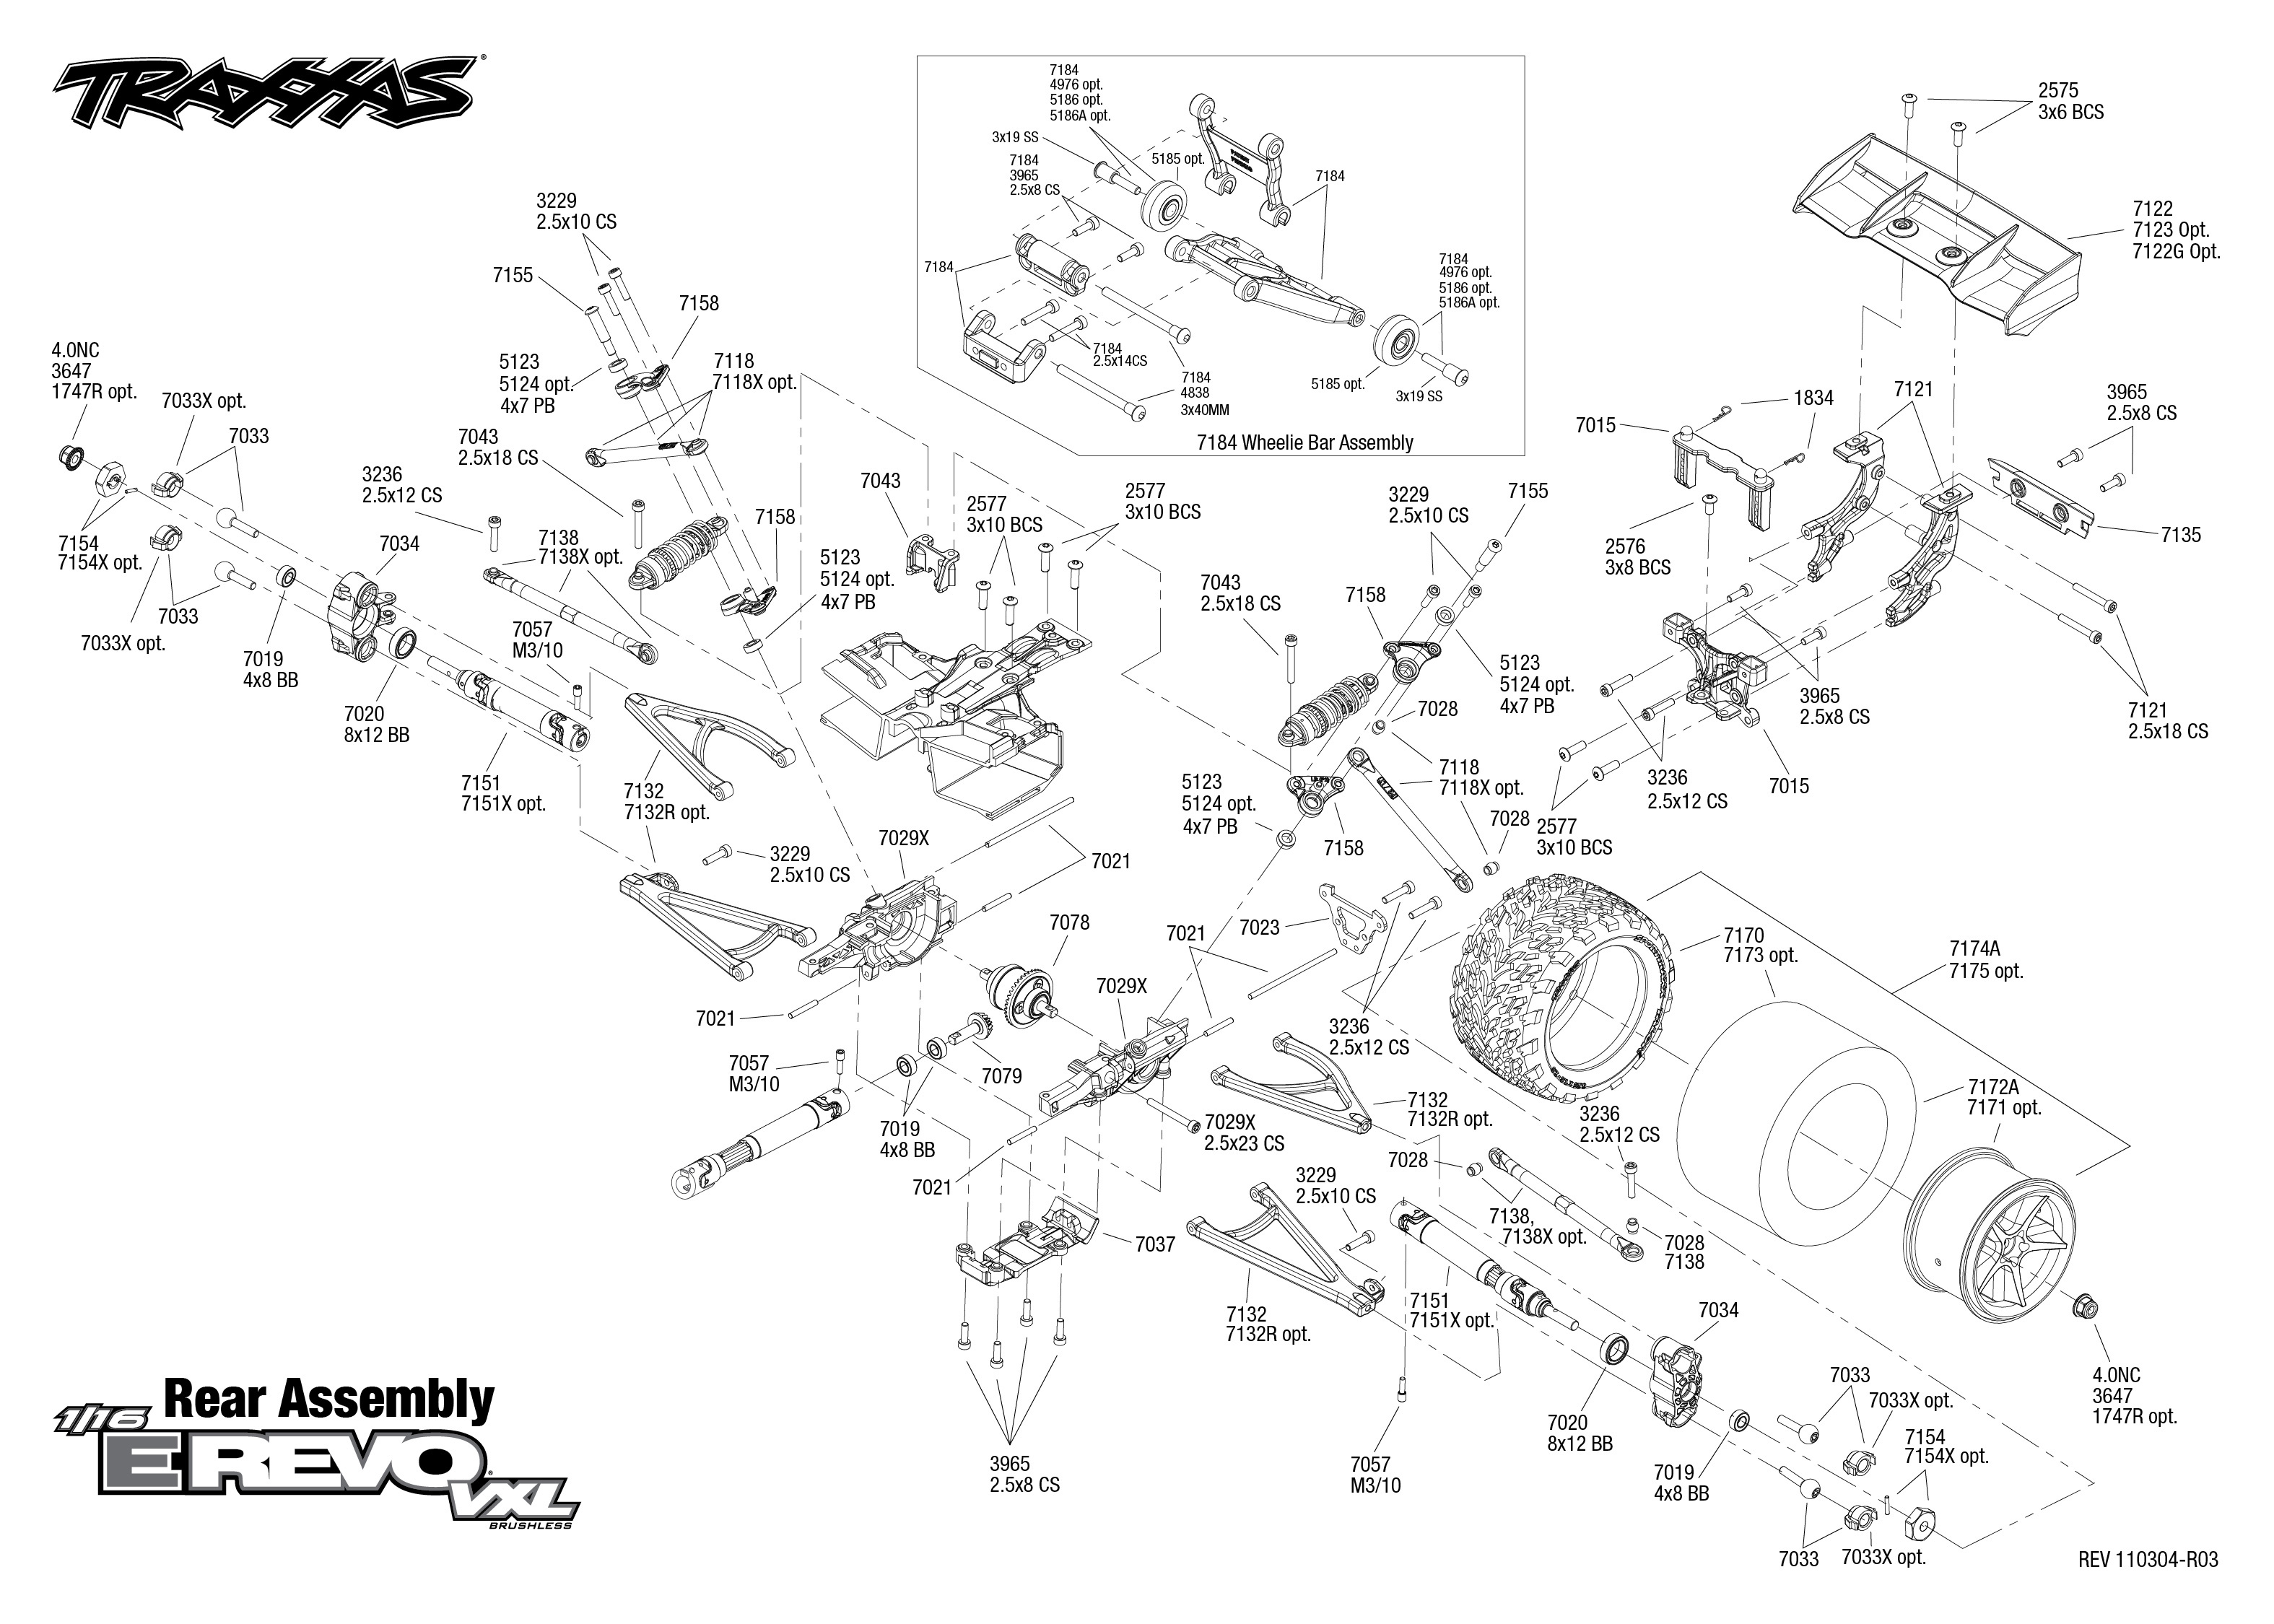 Traxxas Revo Parts Diagram Wiring Diagrams Speed Control For Induction Motors 1 Circuit Tradeoficcom E Rh Treatchildtrauma De 33 List Mini